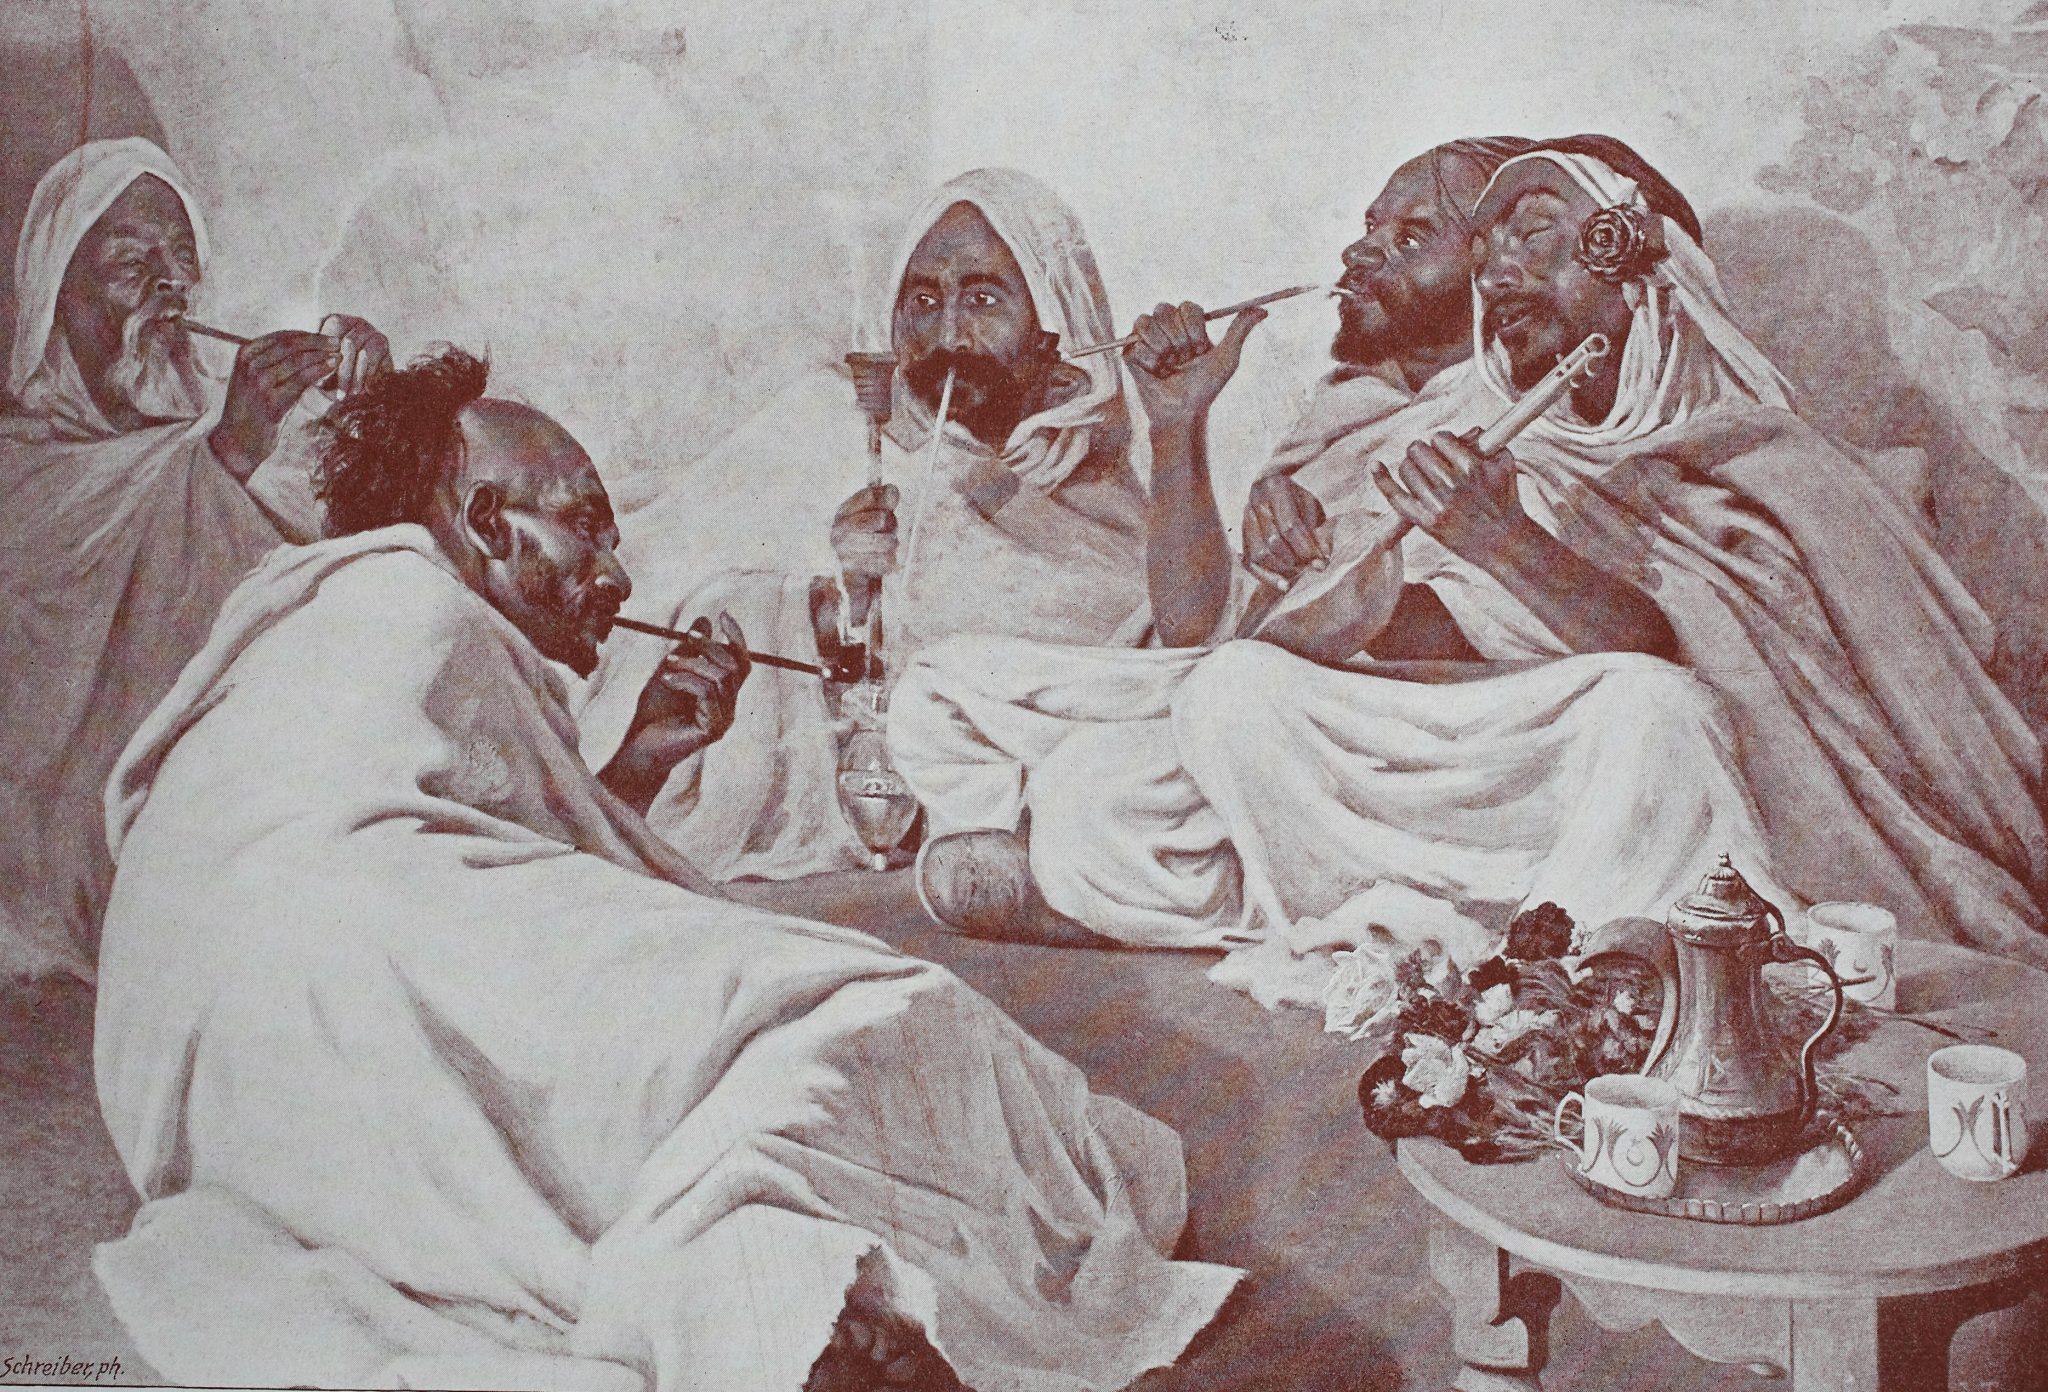 Digitally improved reproduction of hashish smoking, original print from the year 1899